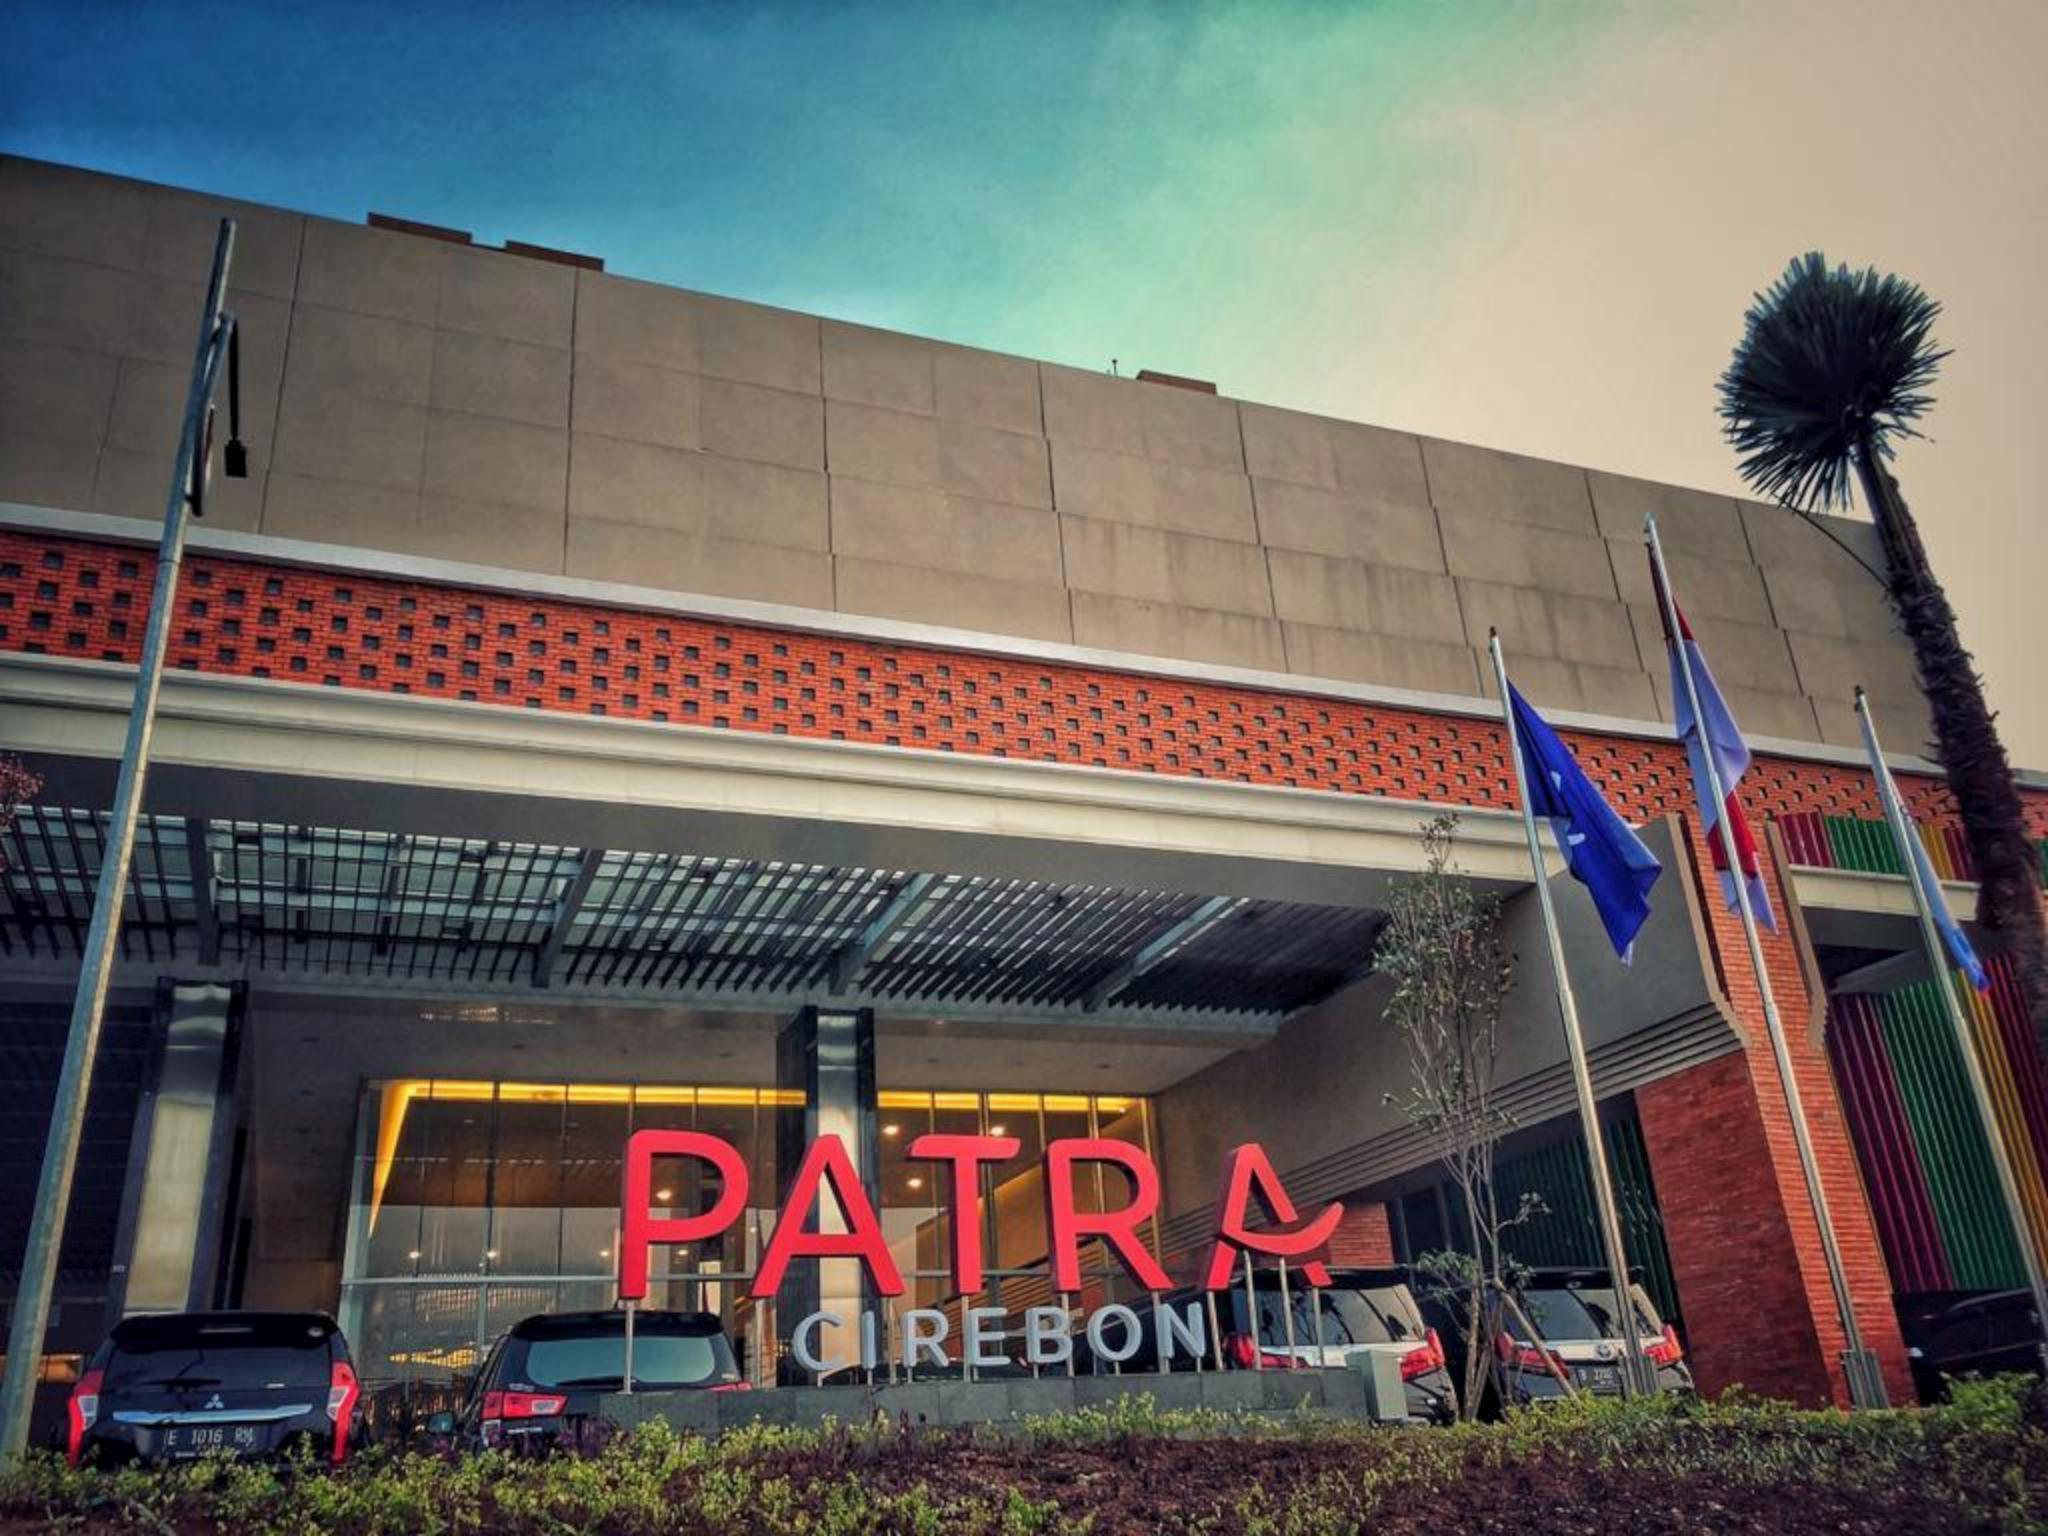 Patra Cirebon Hotel & Convention